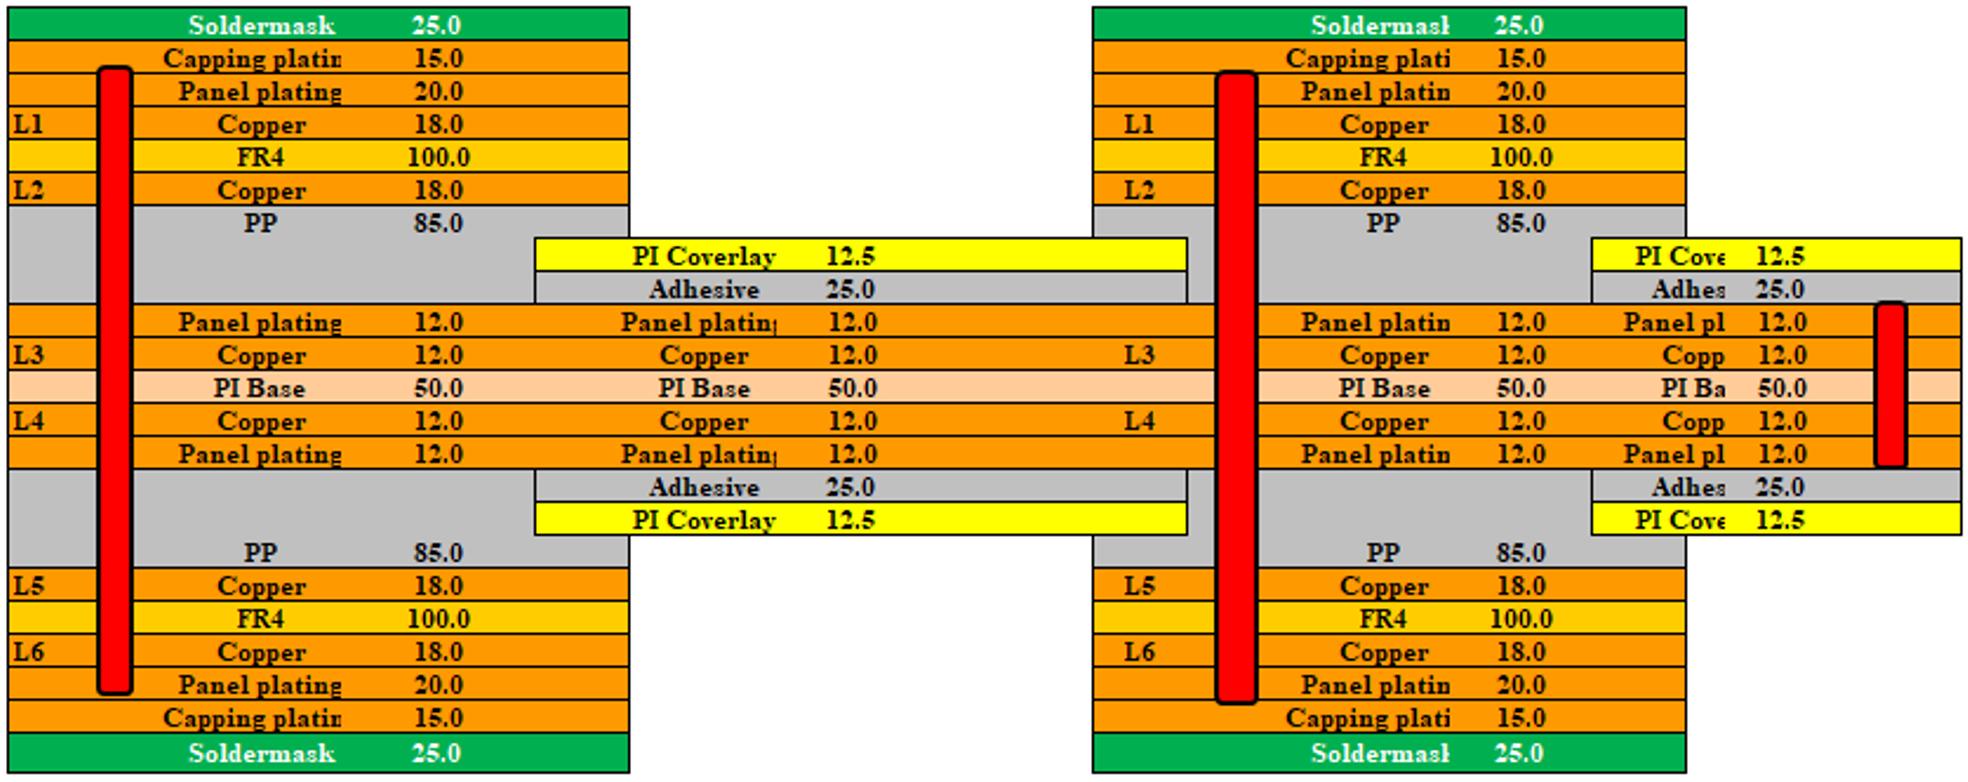 09 Lamination structure rigid flex PCB - Rigid flex PCB - 6L bluetooth rigid-flex board